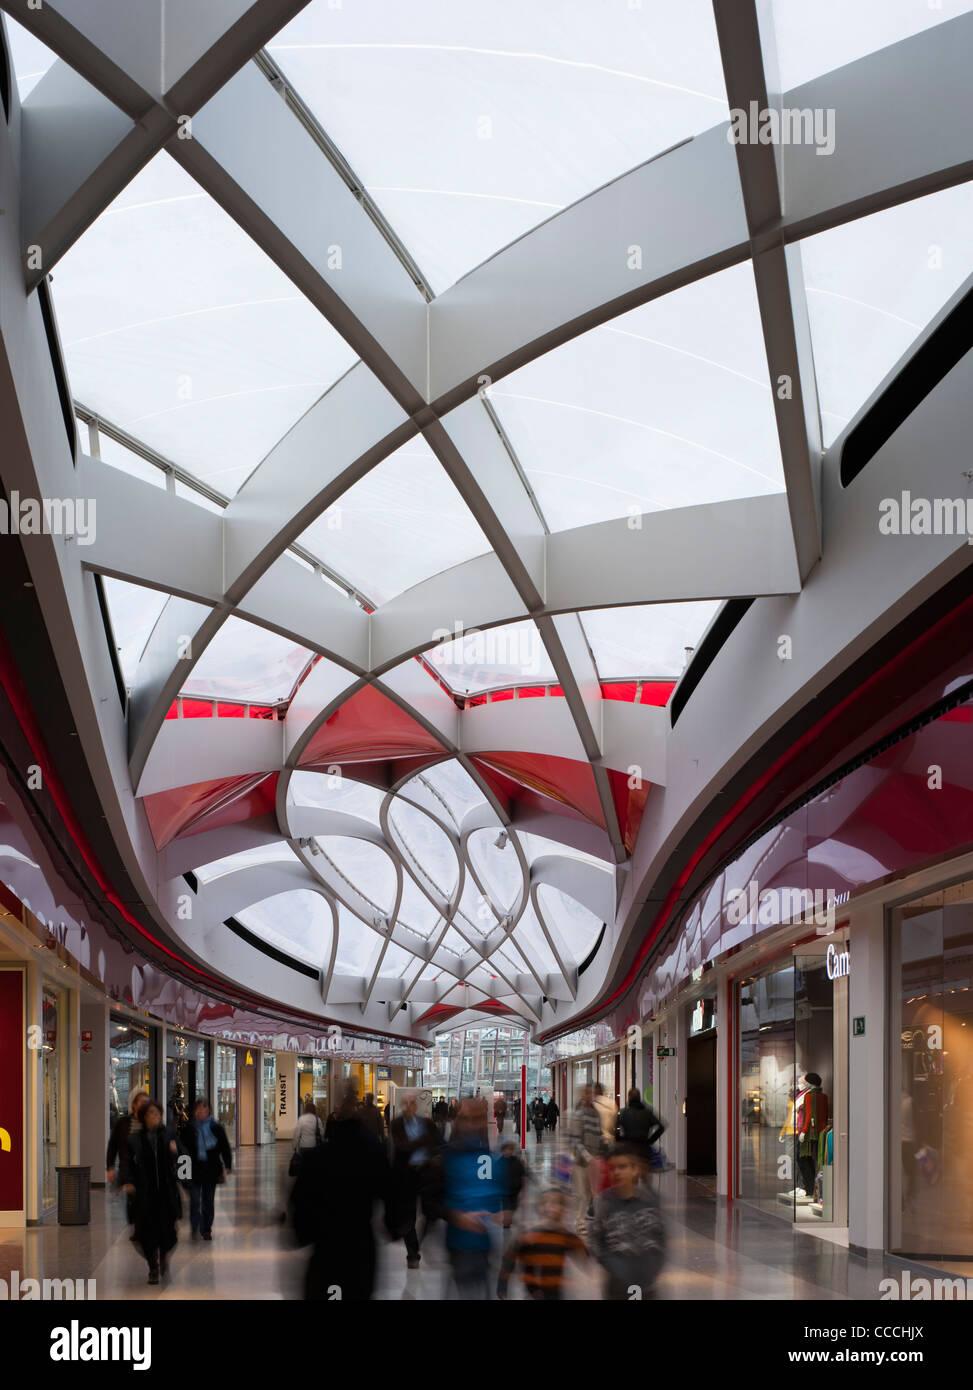 Mediacite Liege Ron Arad Architect 1109 Mall At Ground